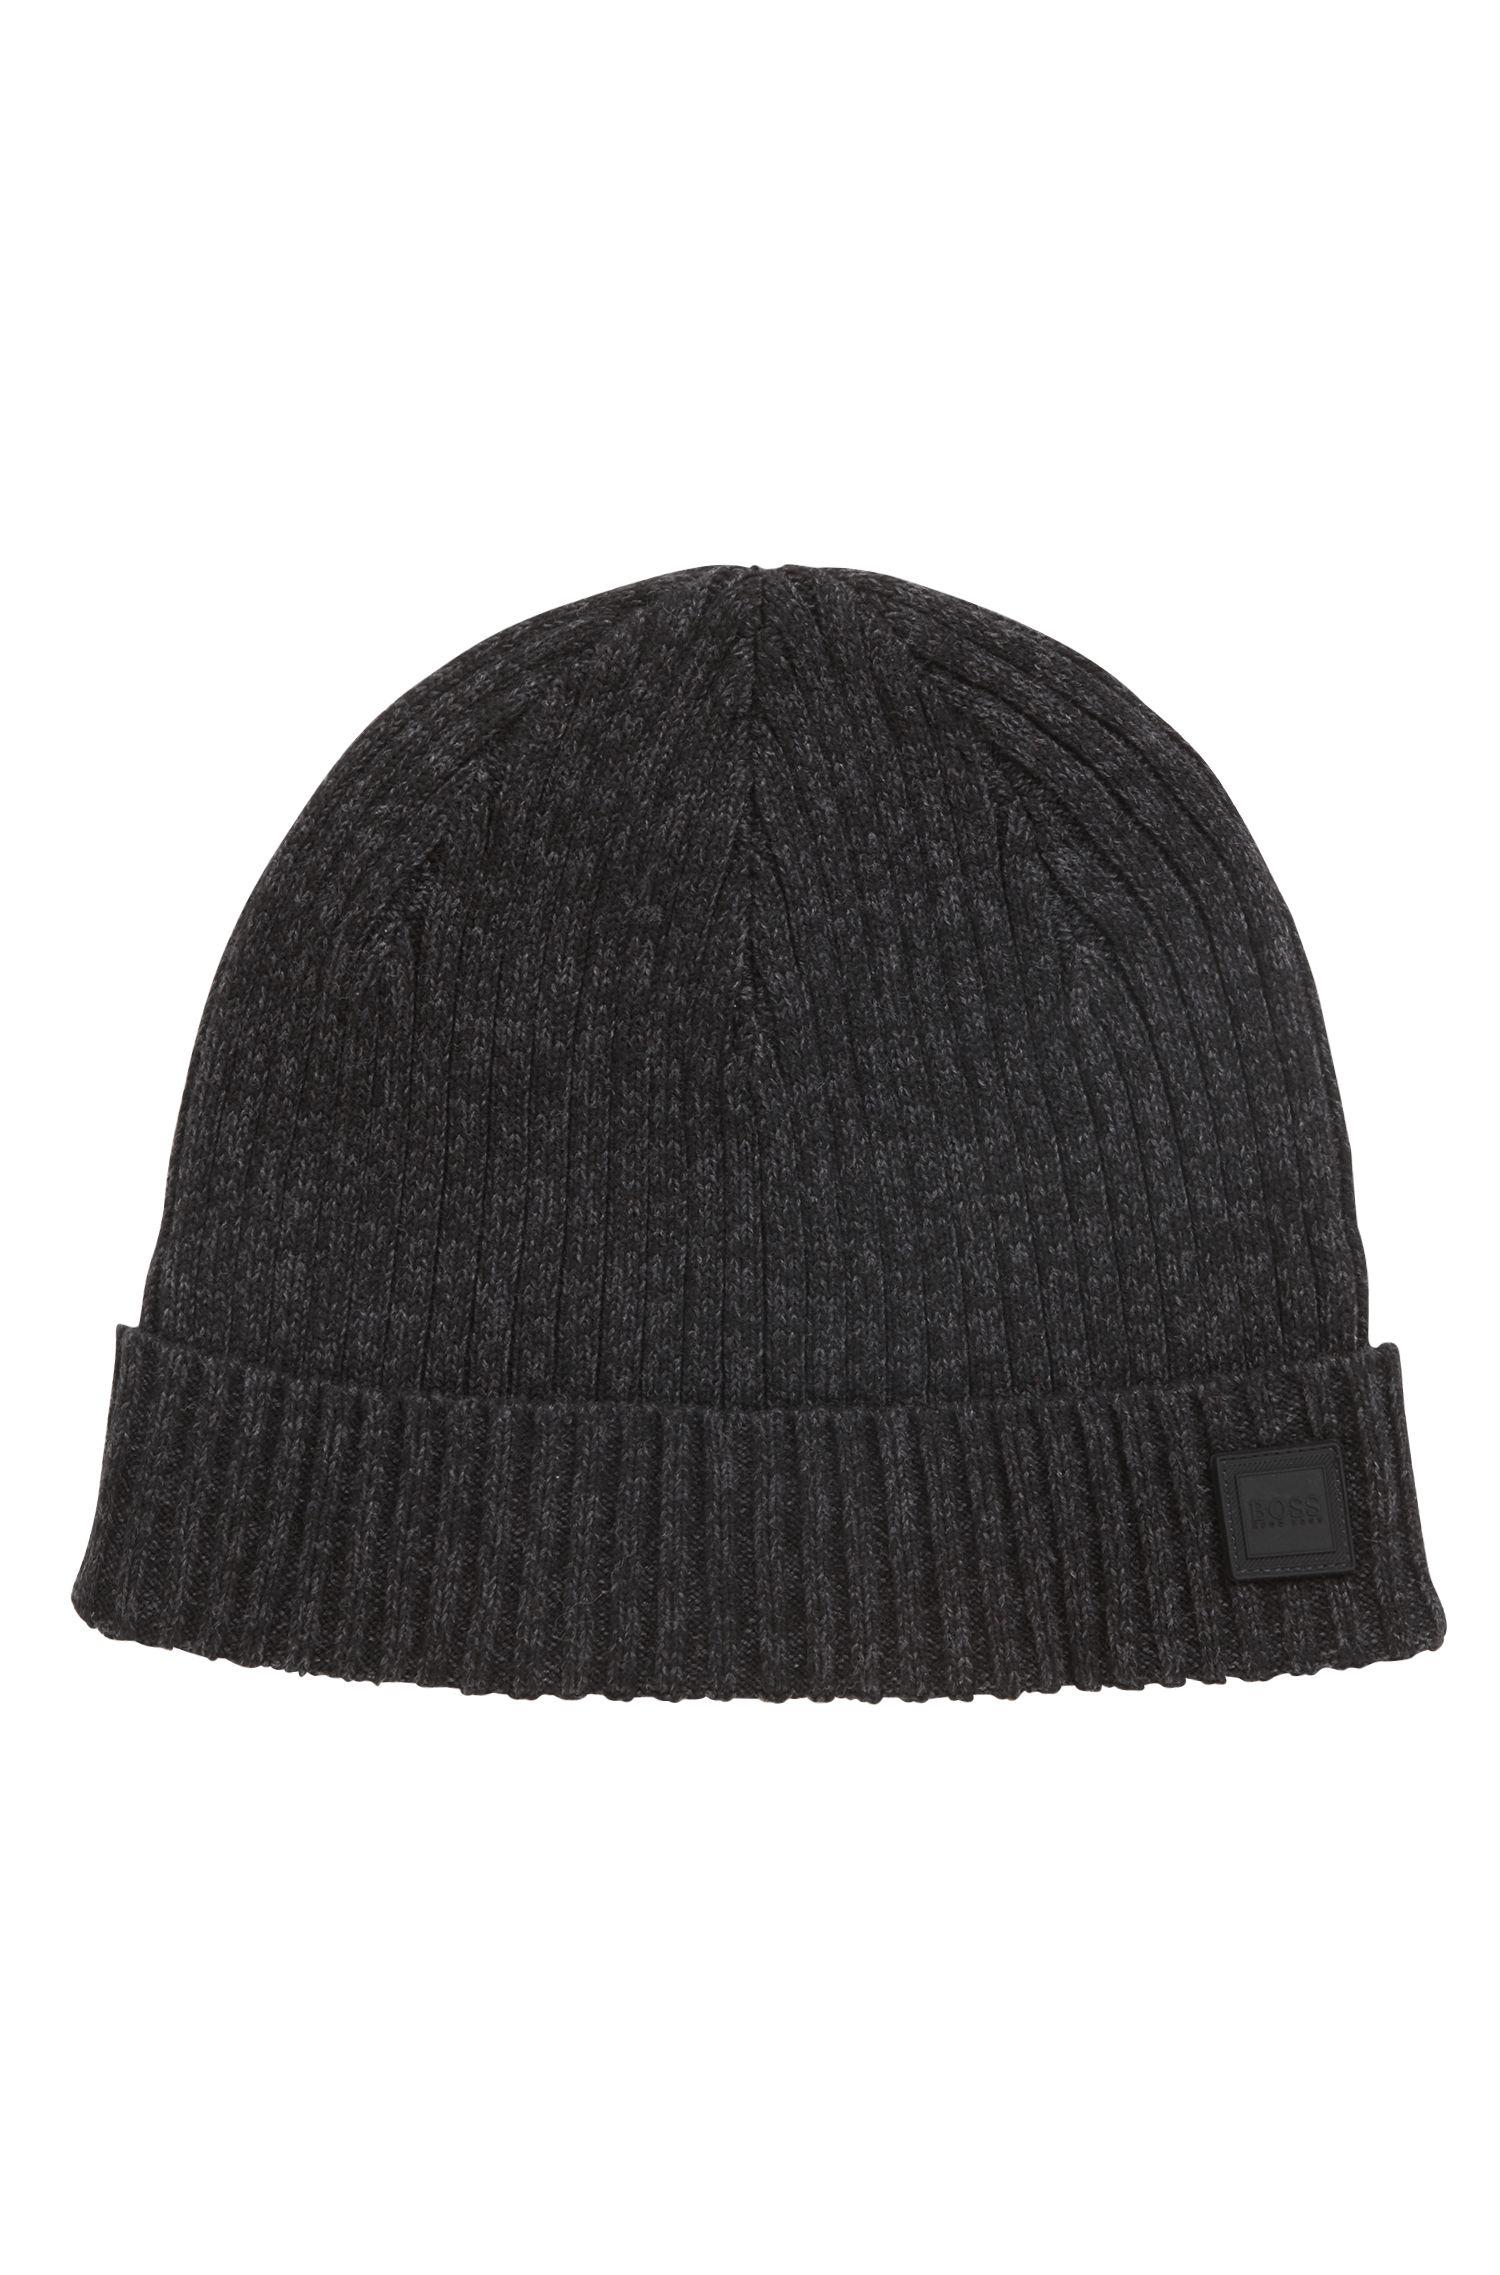 Ribbed beanie hat in a mouliné cotton blend, Black